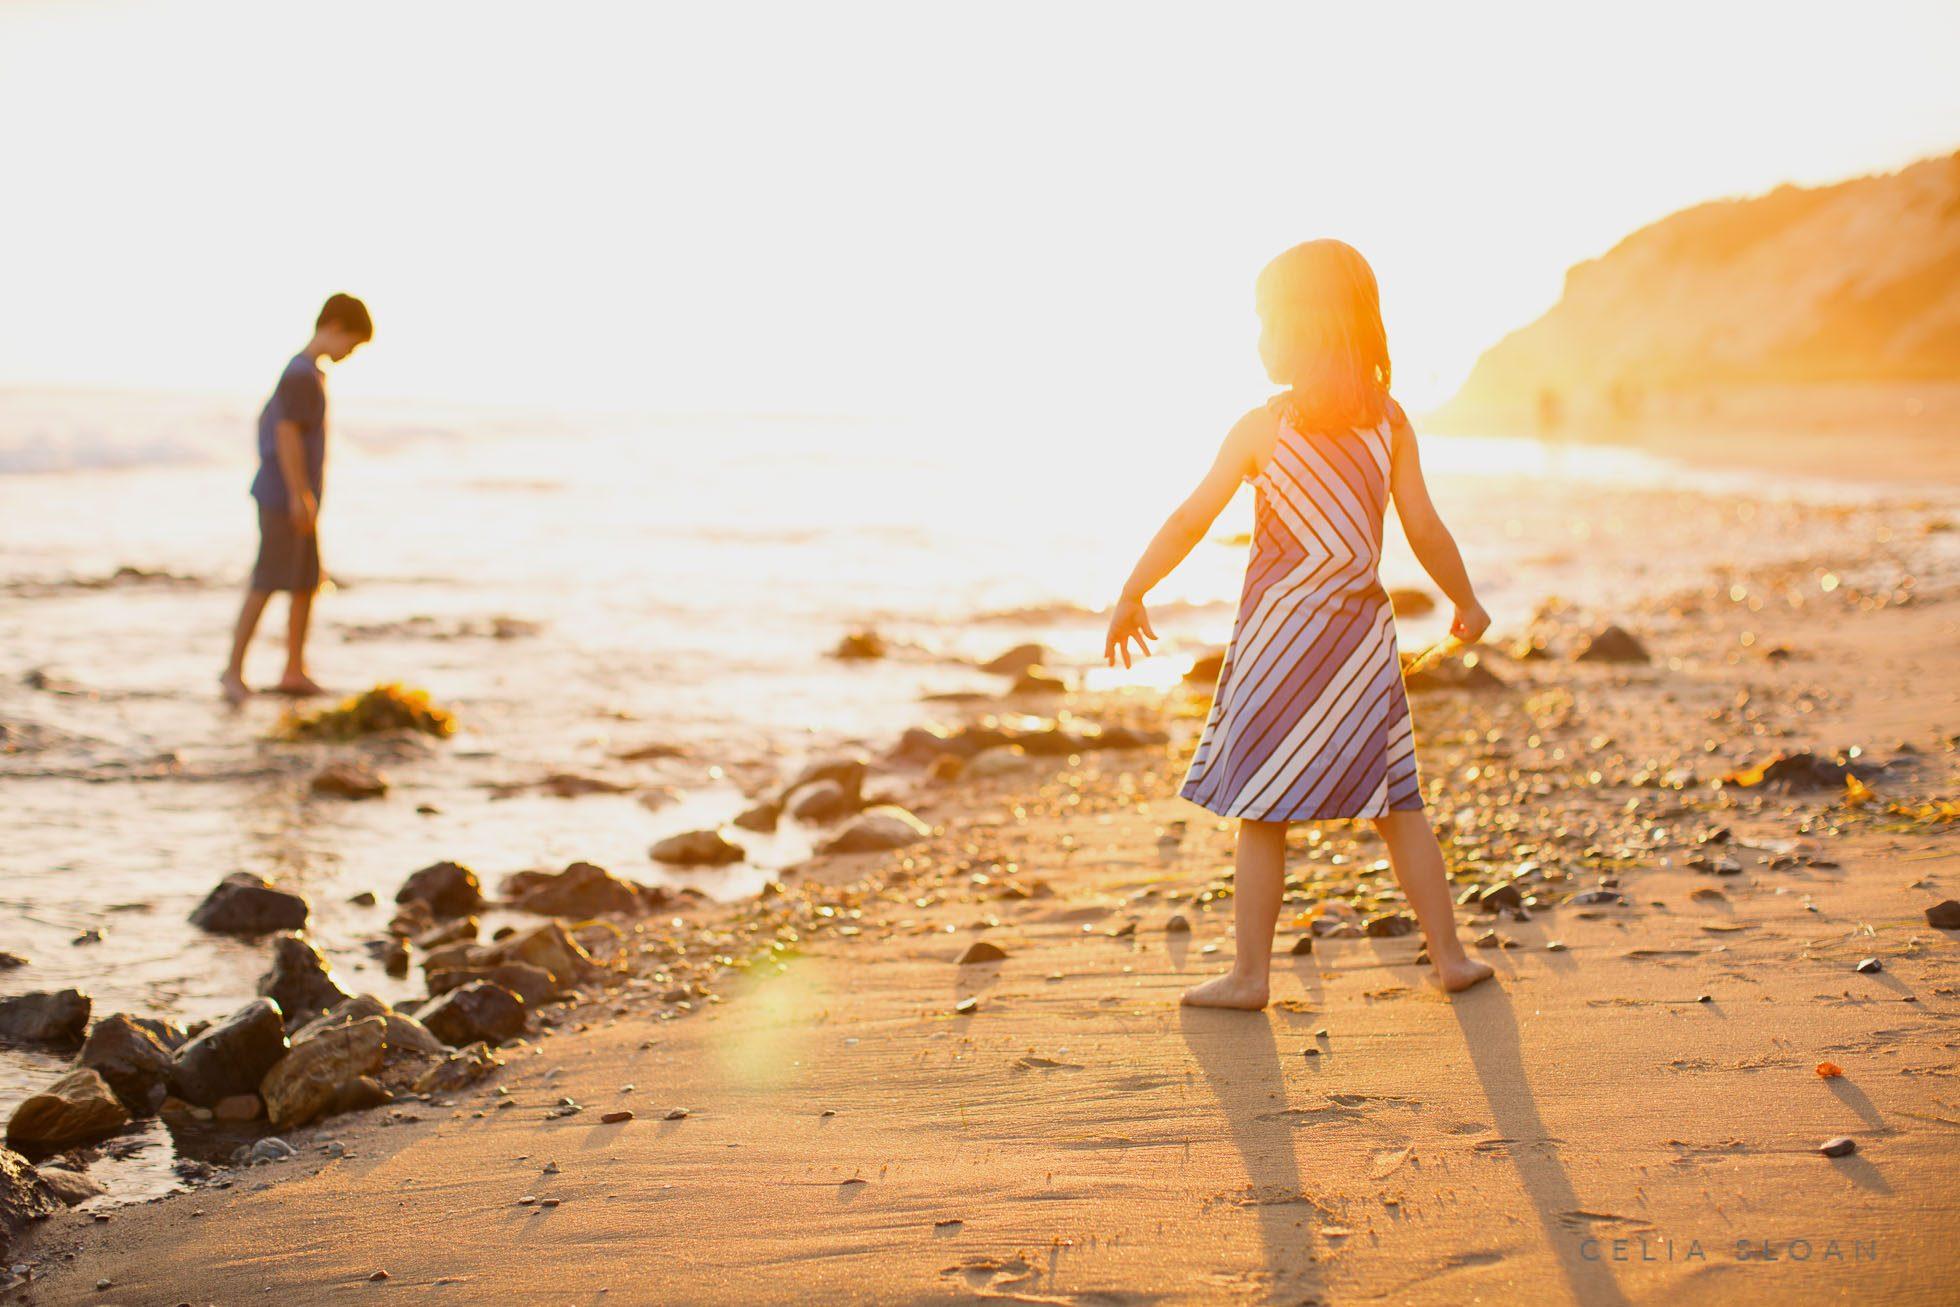 celia-sloan-child-photography-exploring-own-way-beach sunset